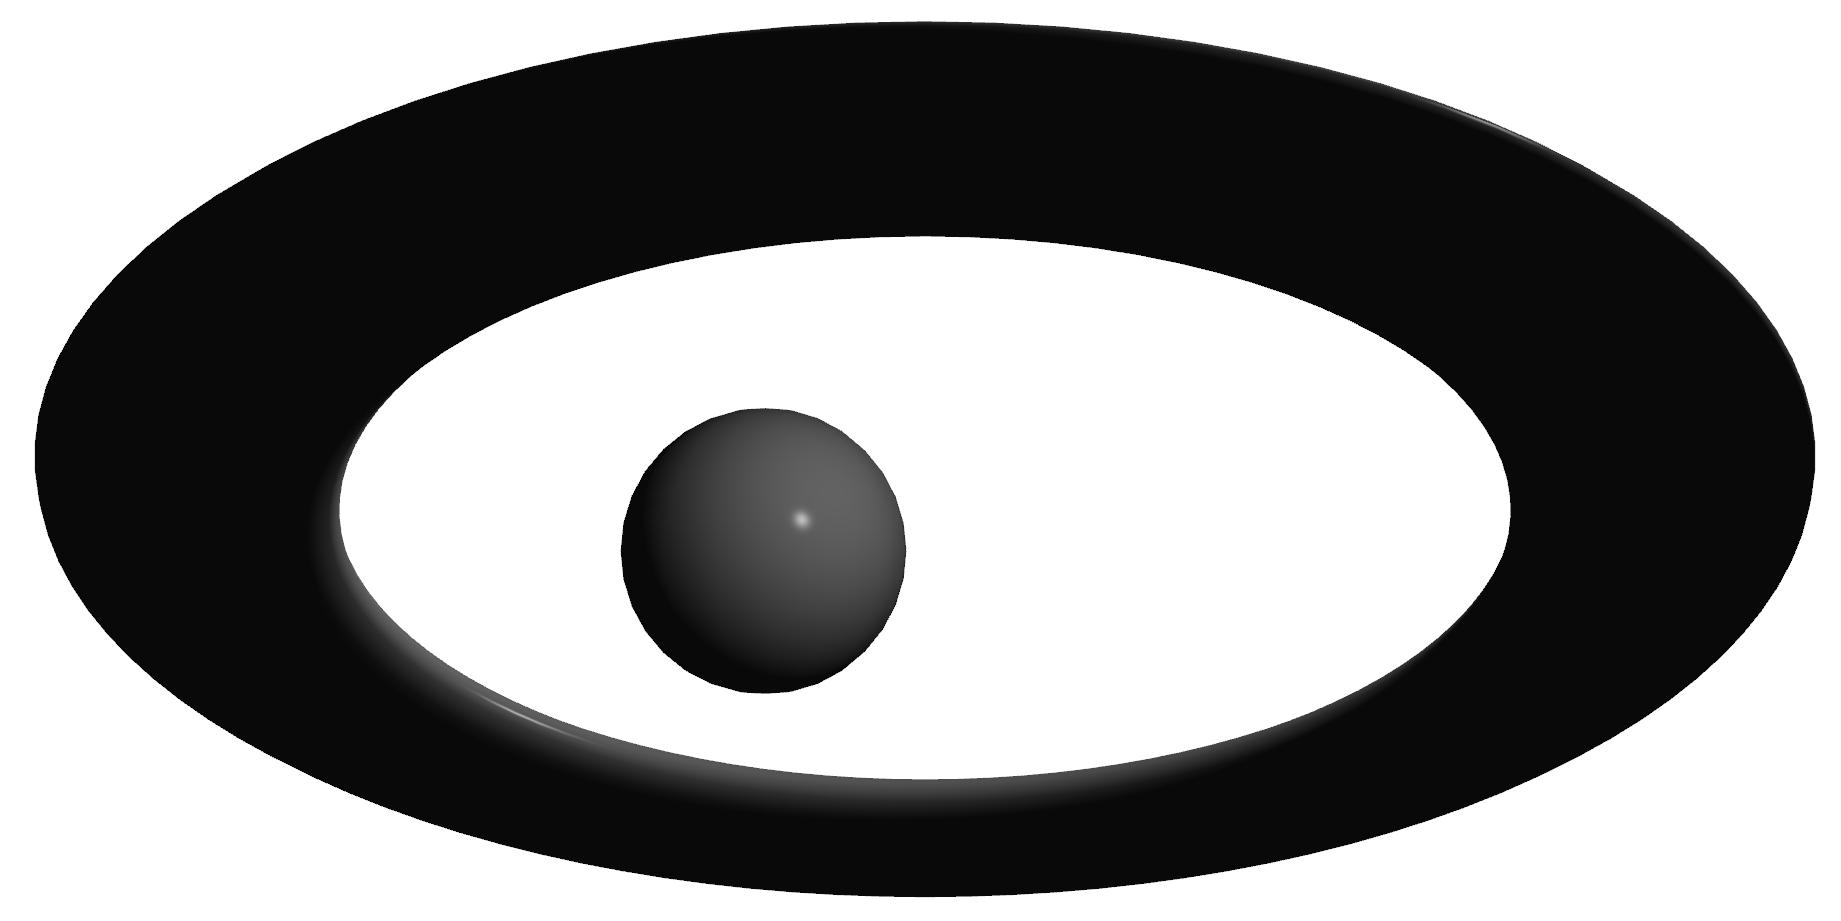 Simple C++ Example